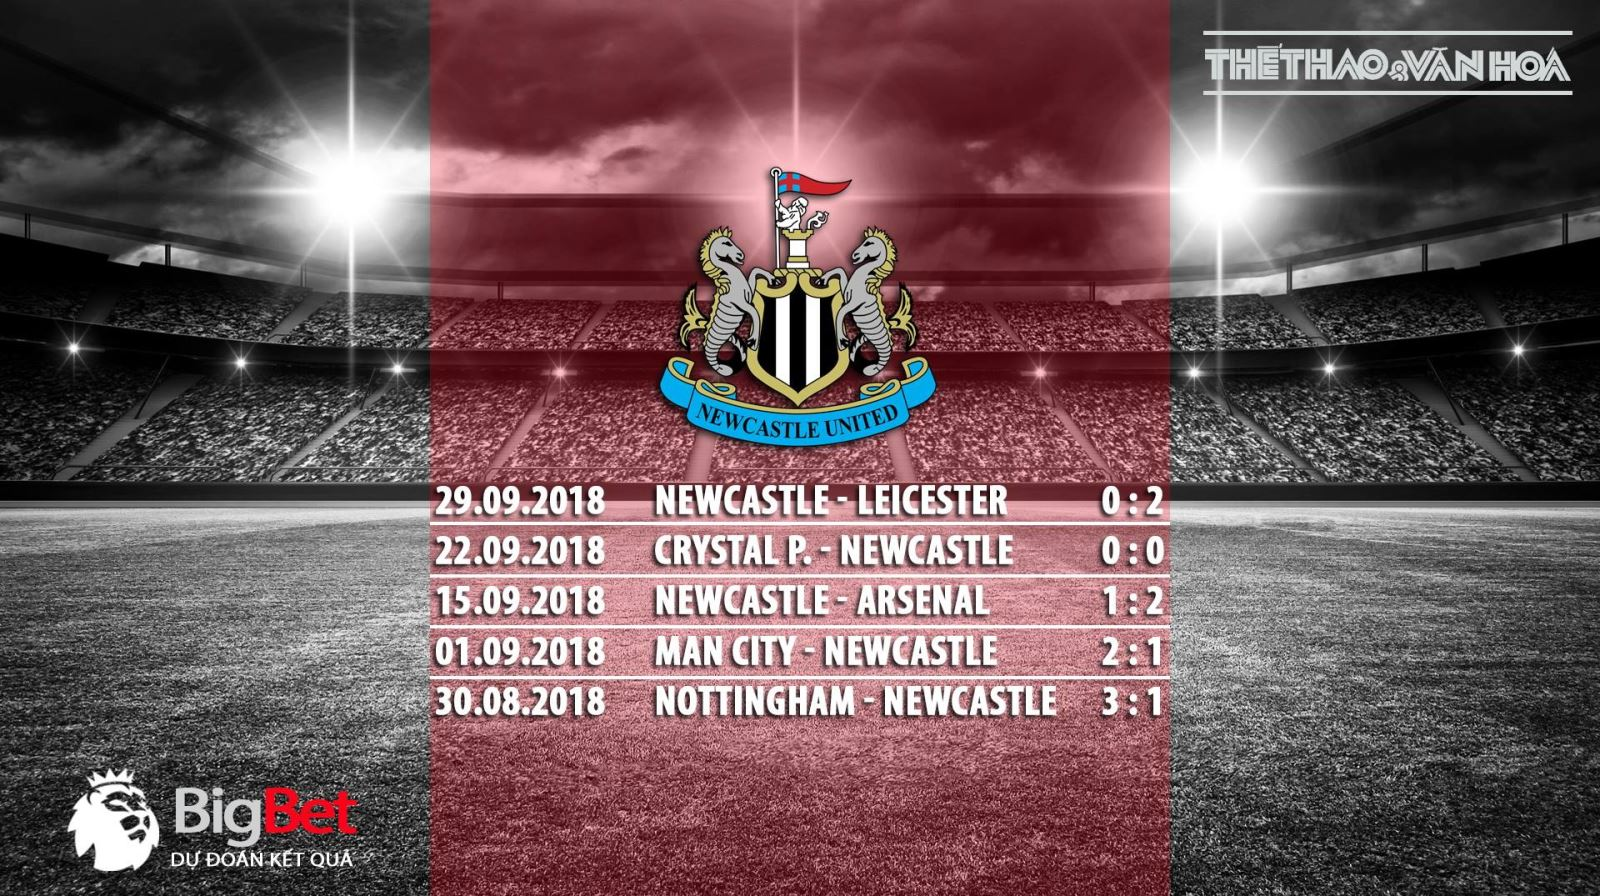 Soi kèo M.U vs Newcastle (23h30 ngày 6/10). Nhận định trận M.U vs Newcastle.